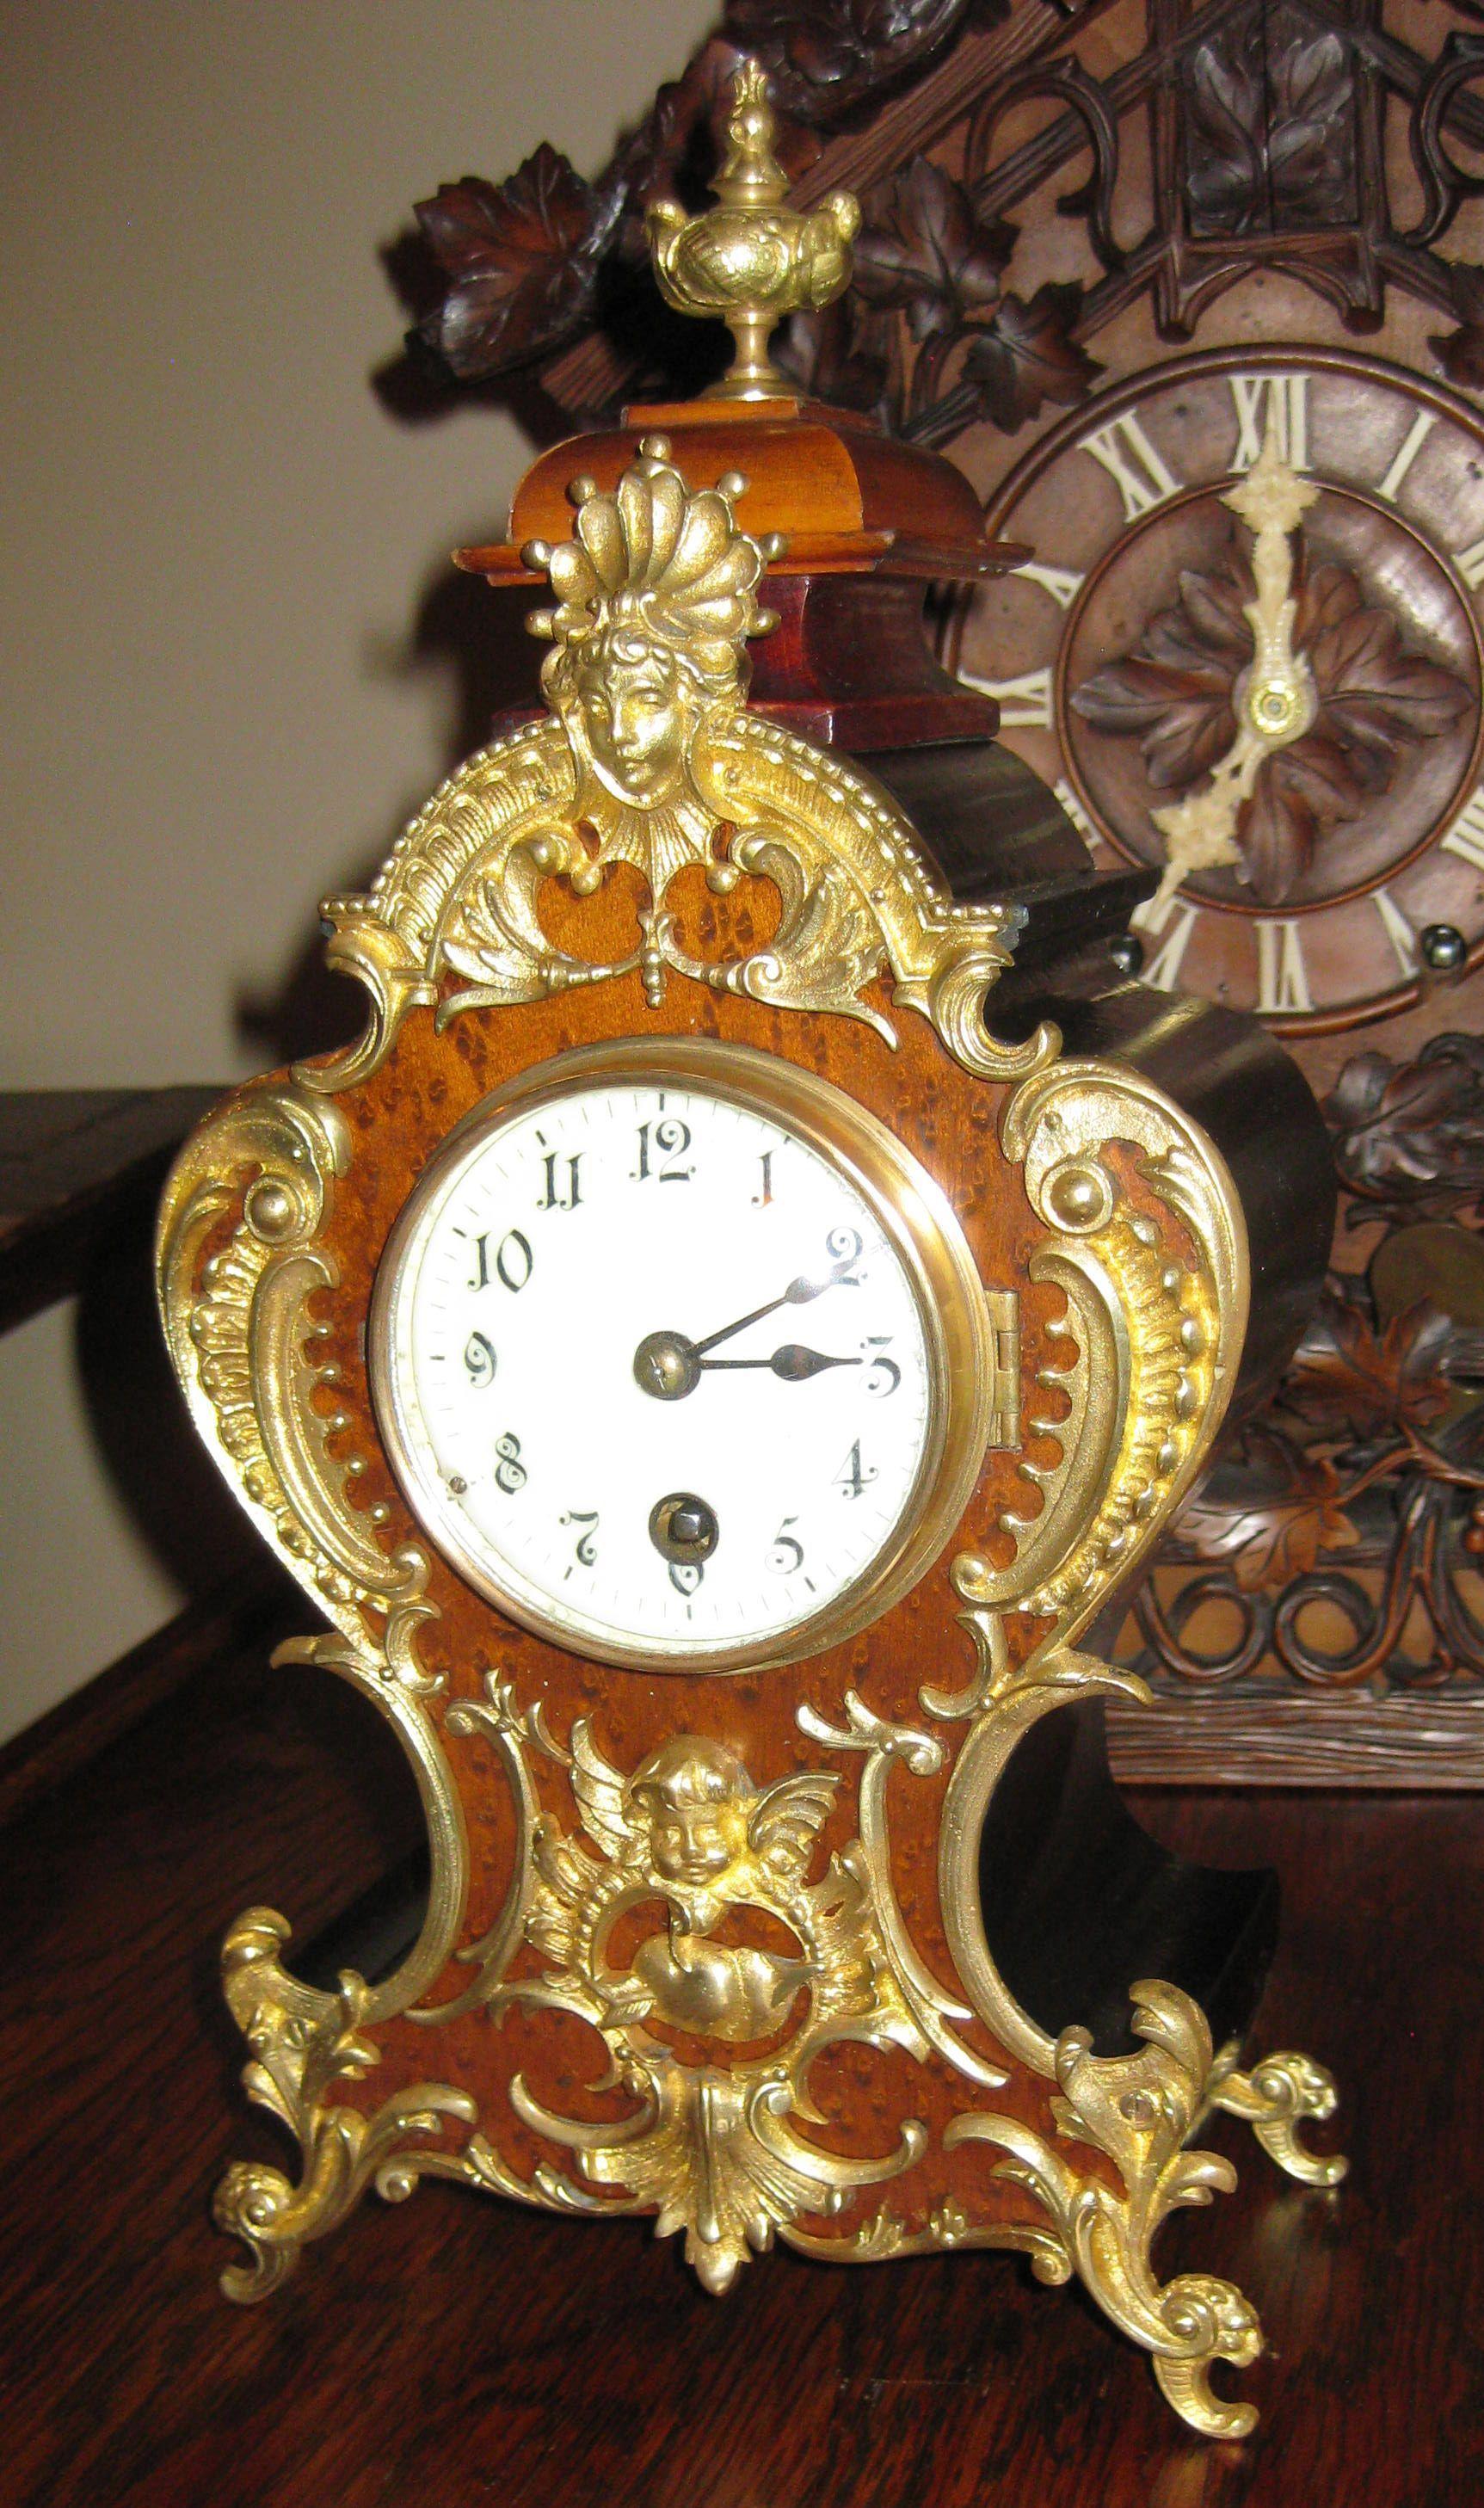 George S Antique Clocks Antique Clocks Vintage Clock Wall